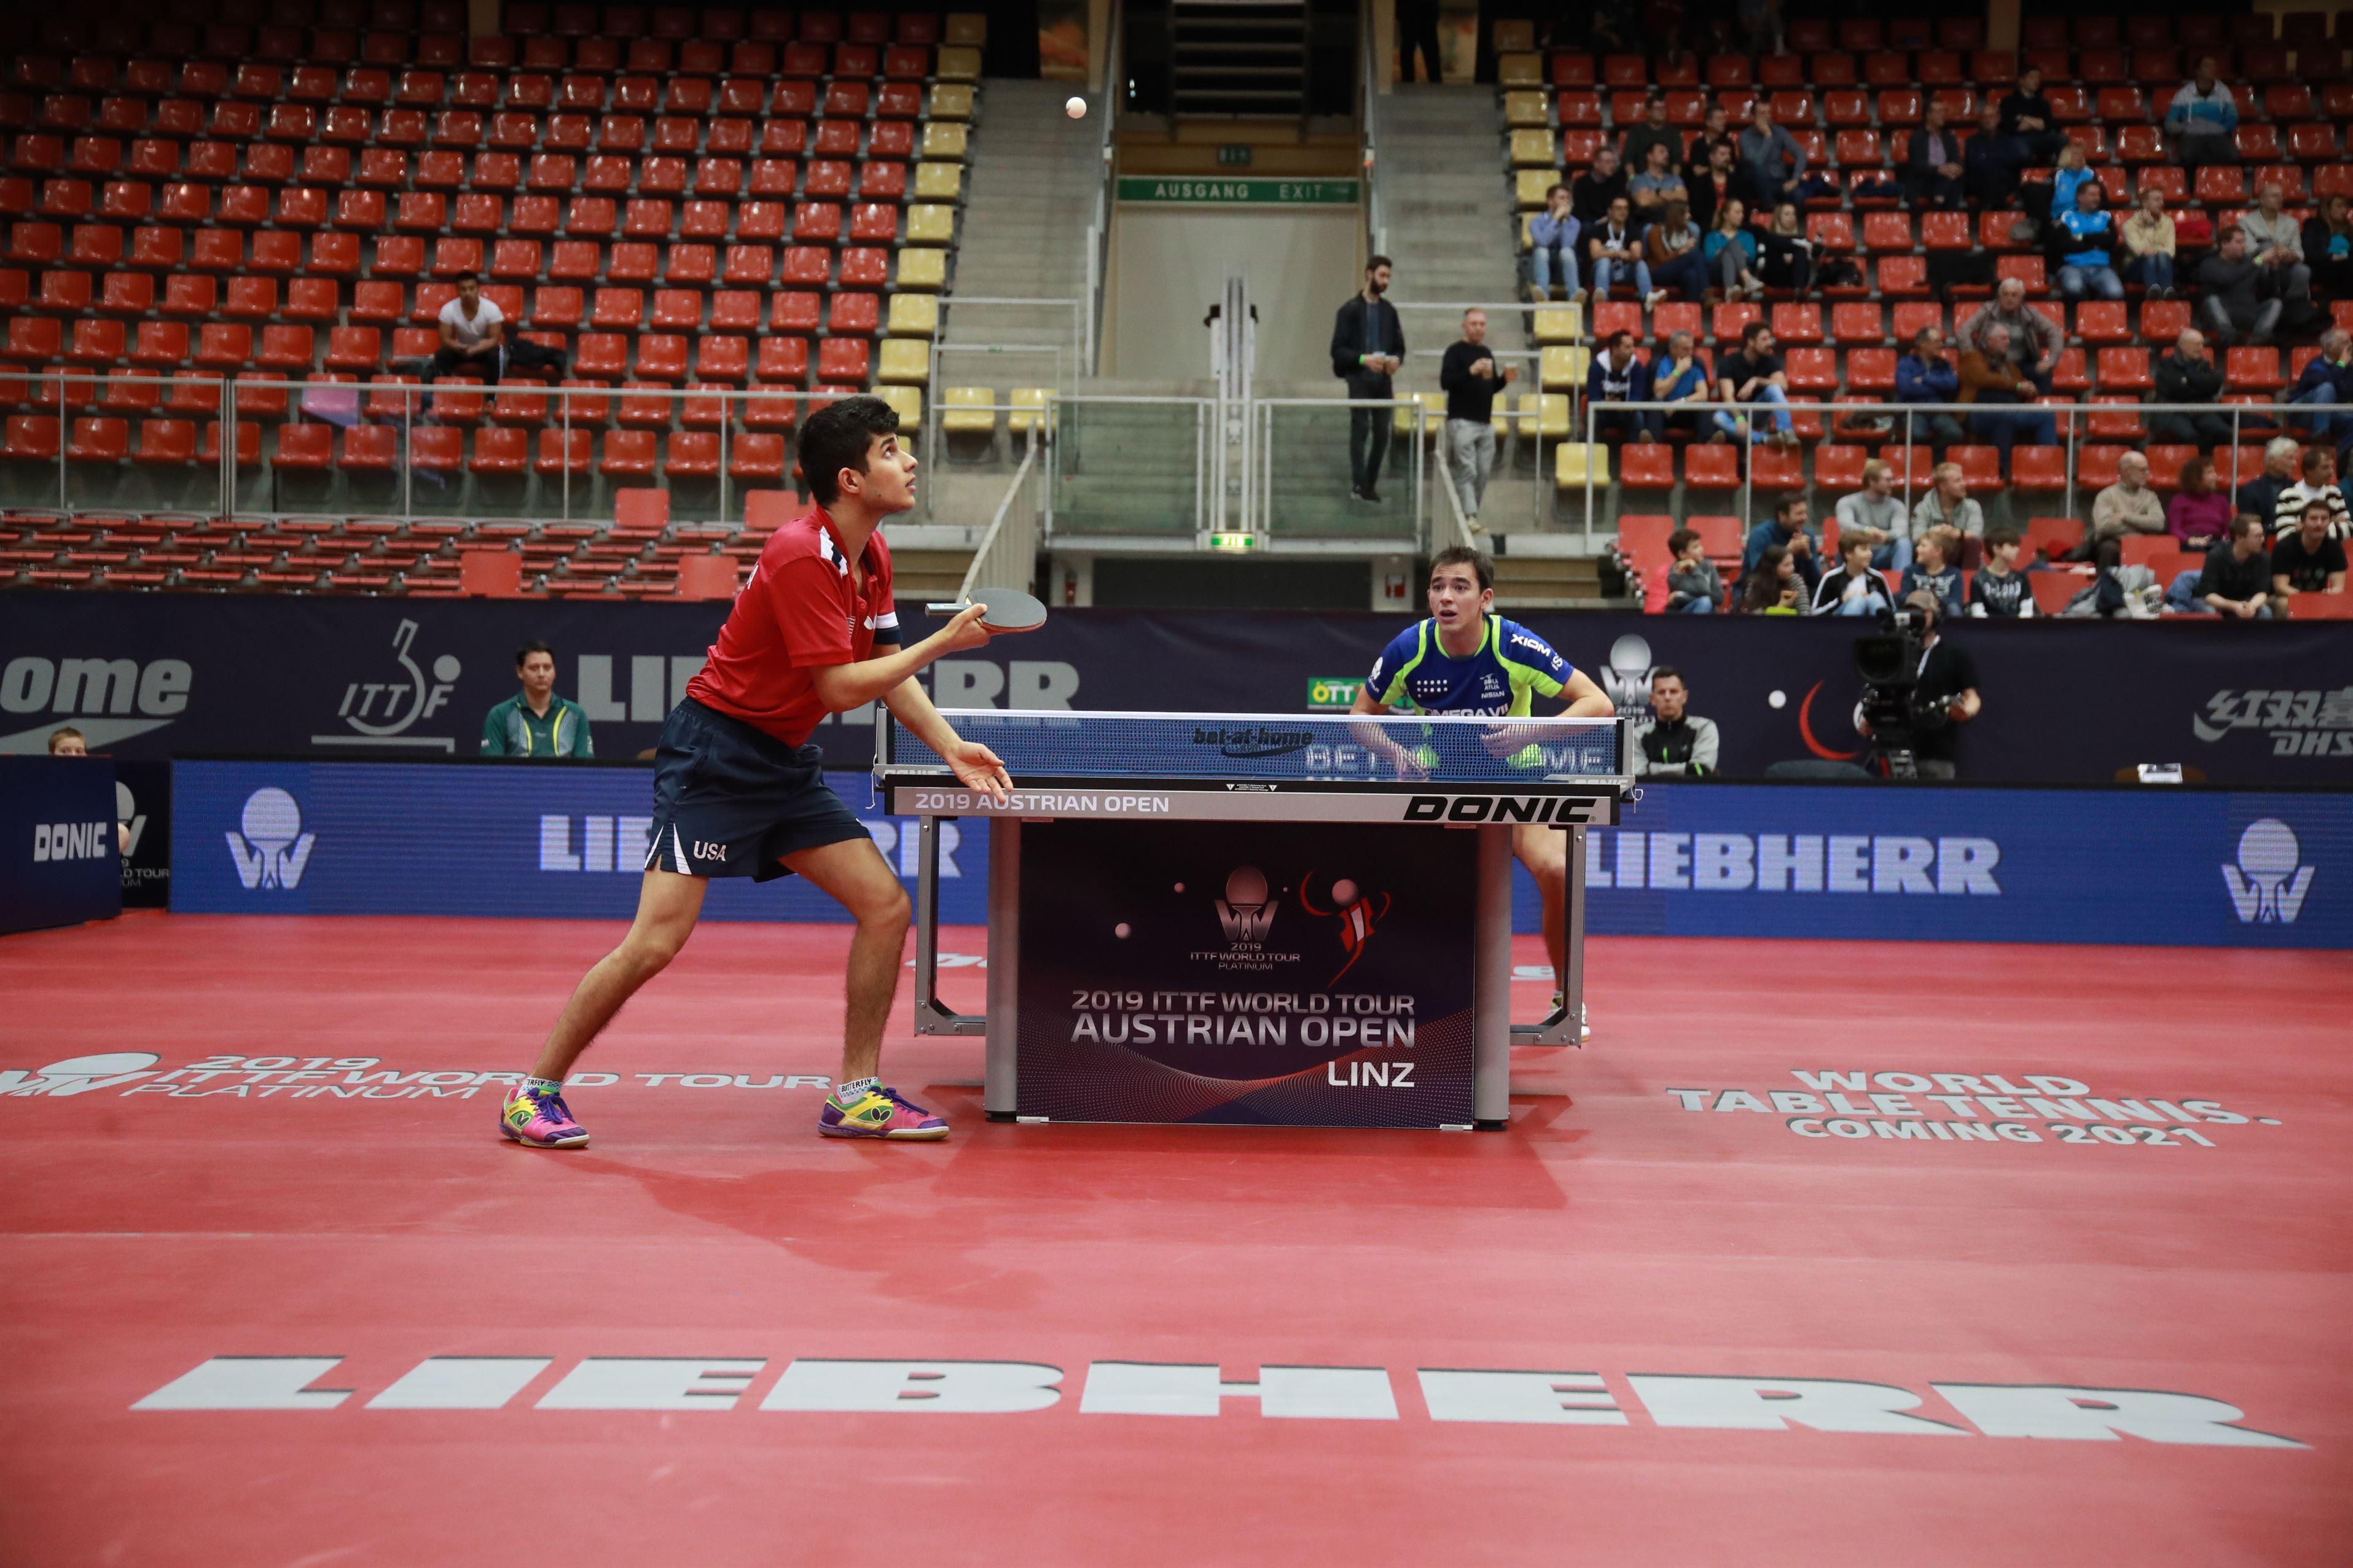 Austrian Open Update: Through to the Quarterfinals in Linz